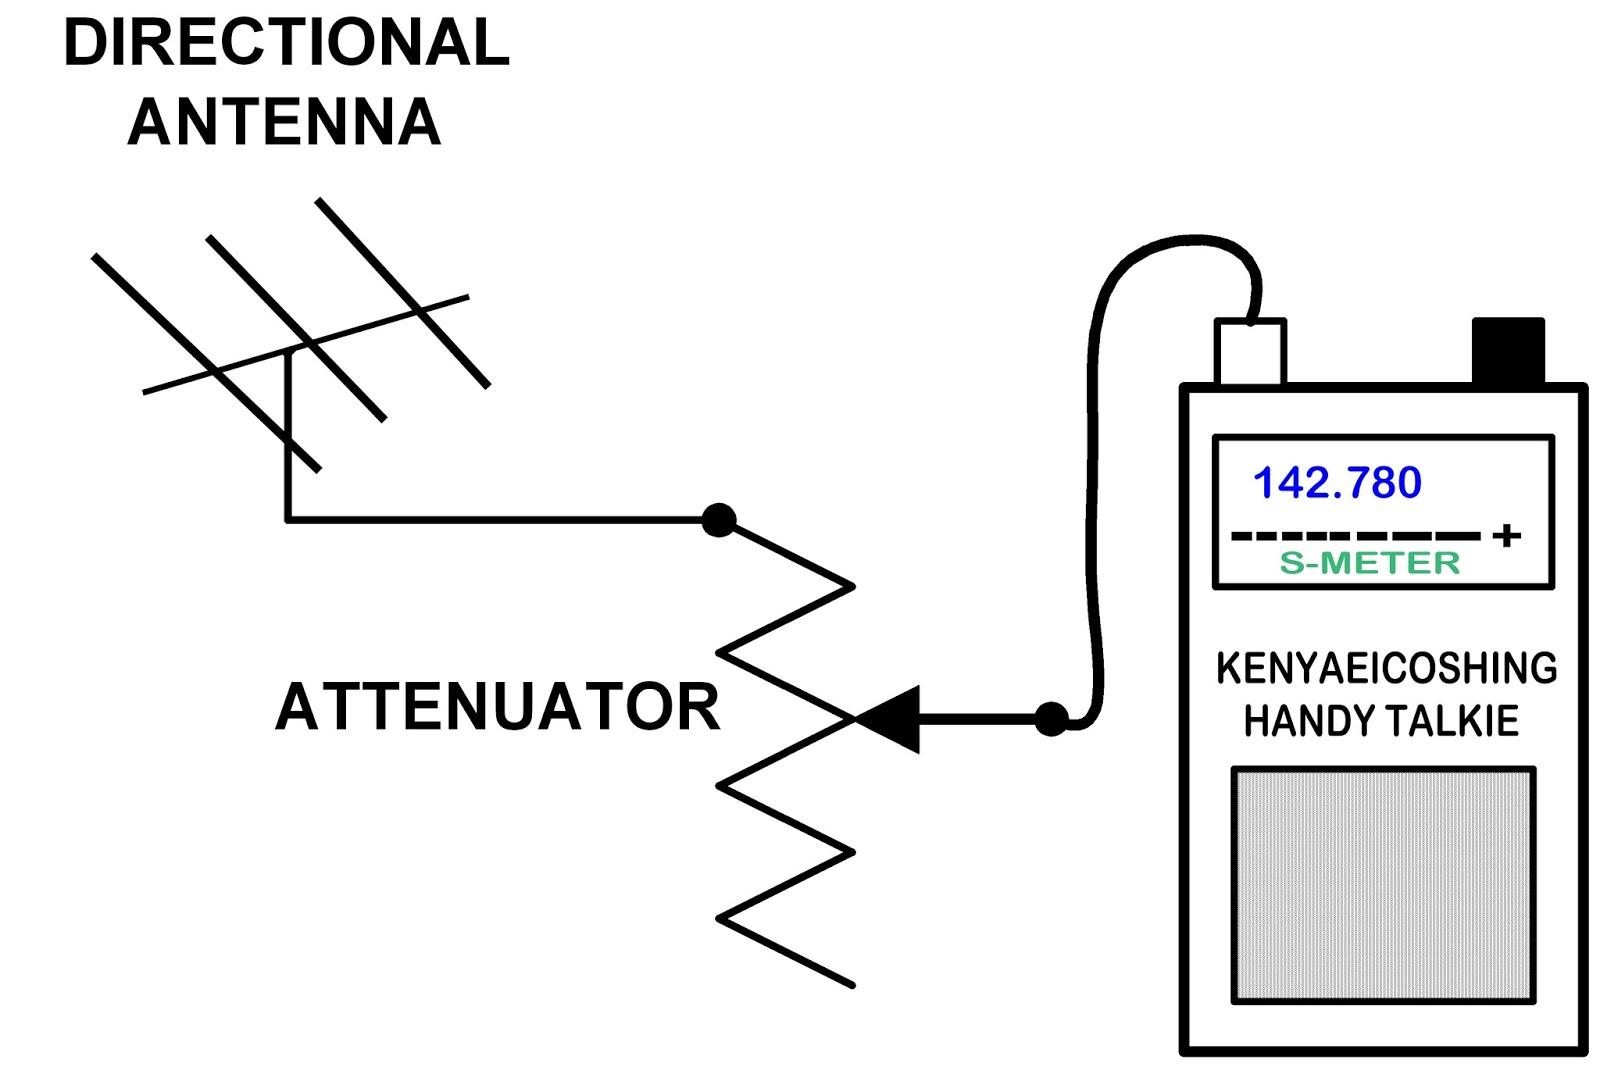 Kr7ws Ham Radio Blog 2 Meter Ardf Attenuator Project Homemade Antenna Wiring Diagram Simplified Schematic Of